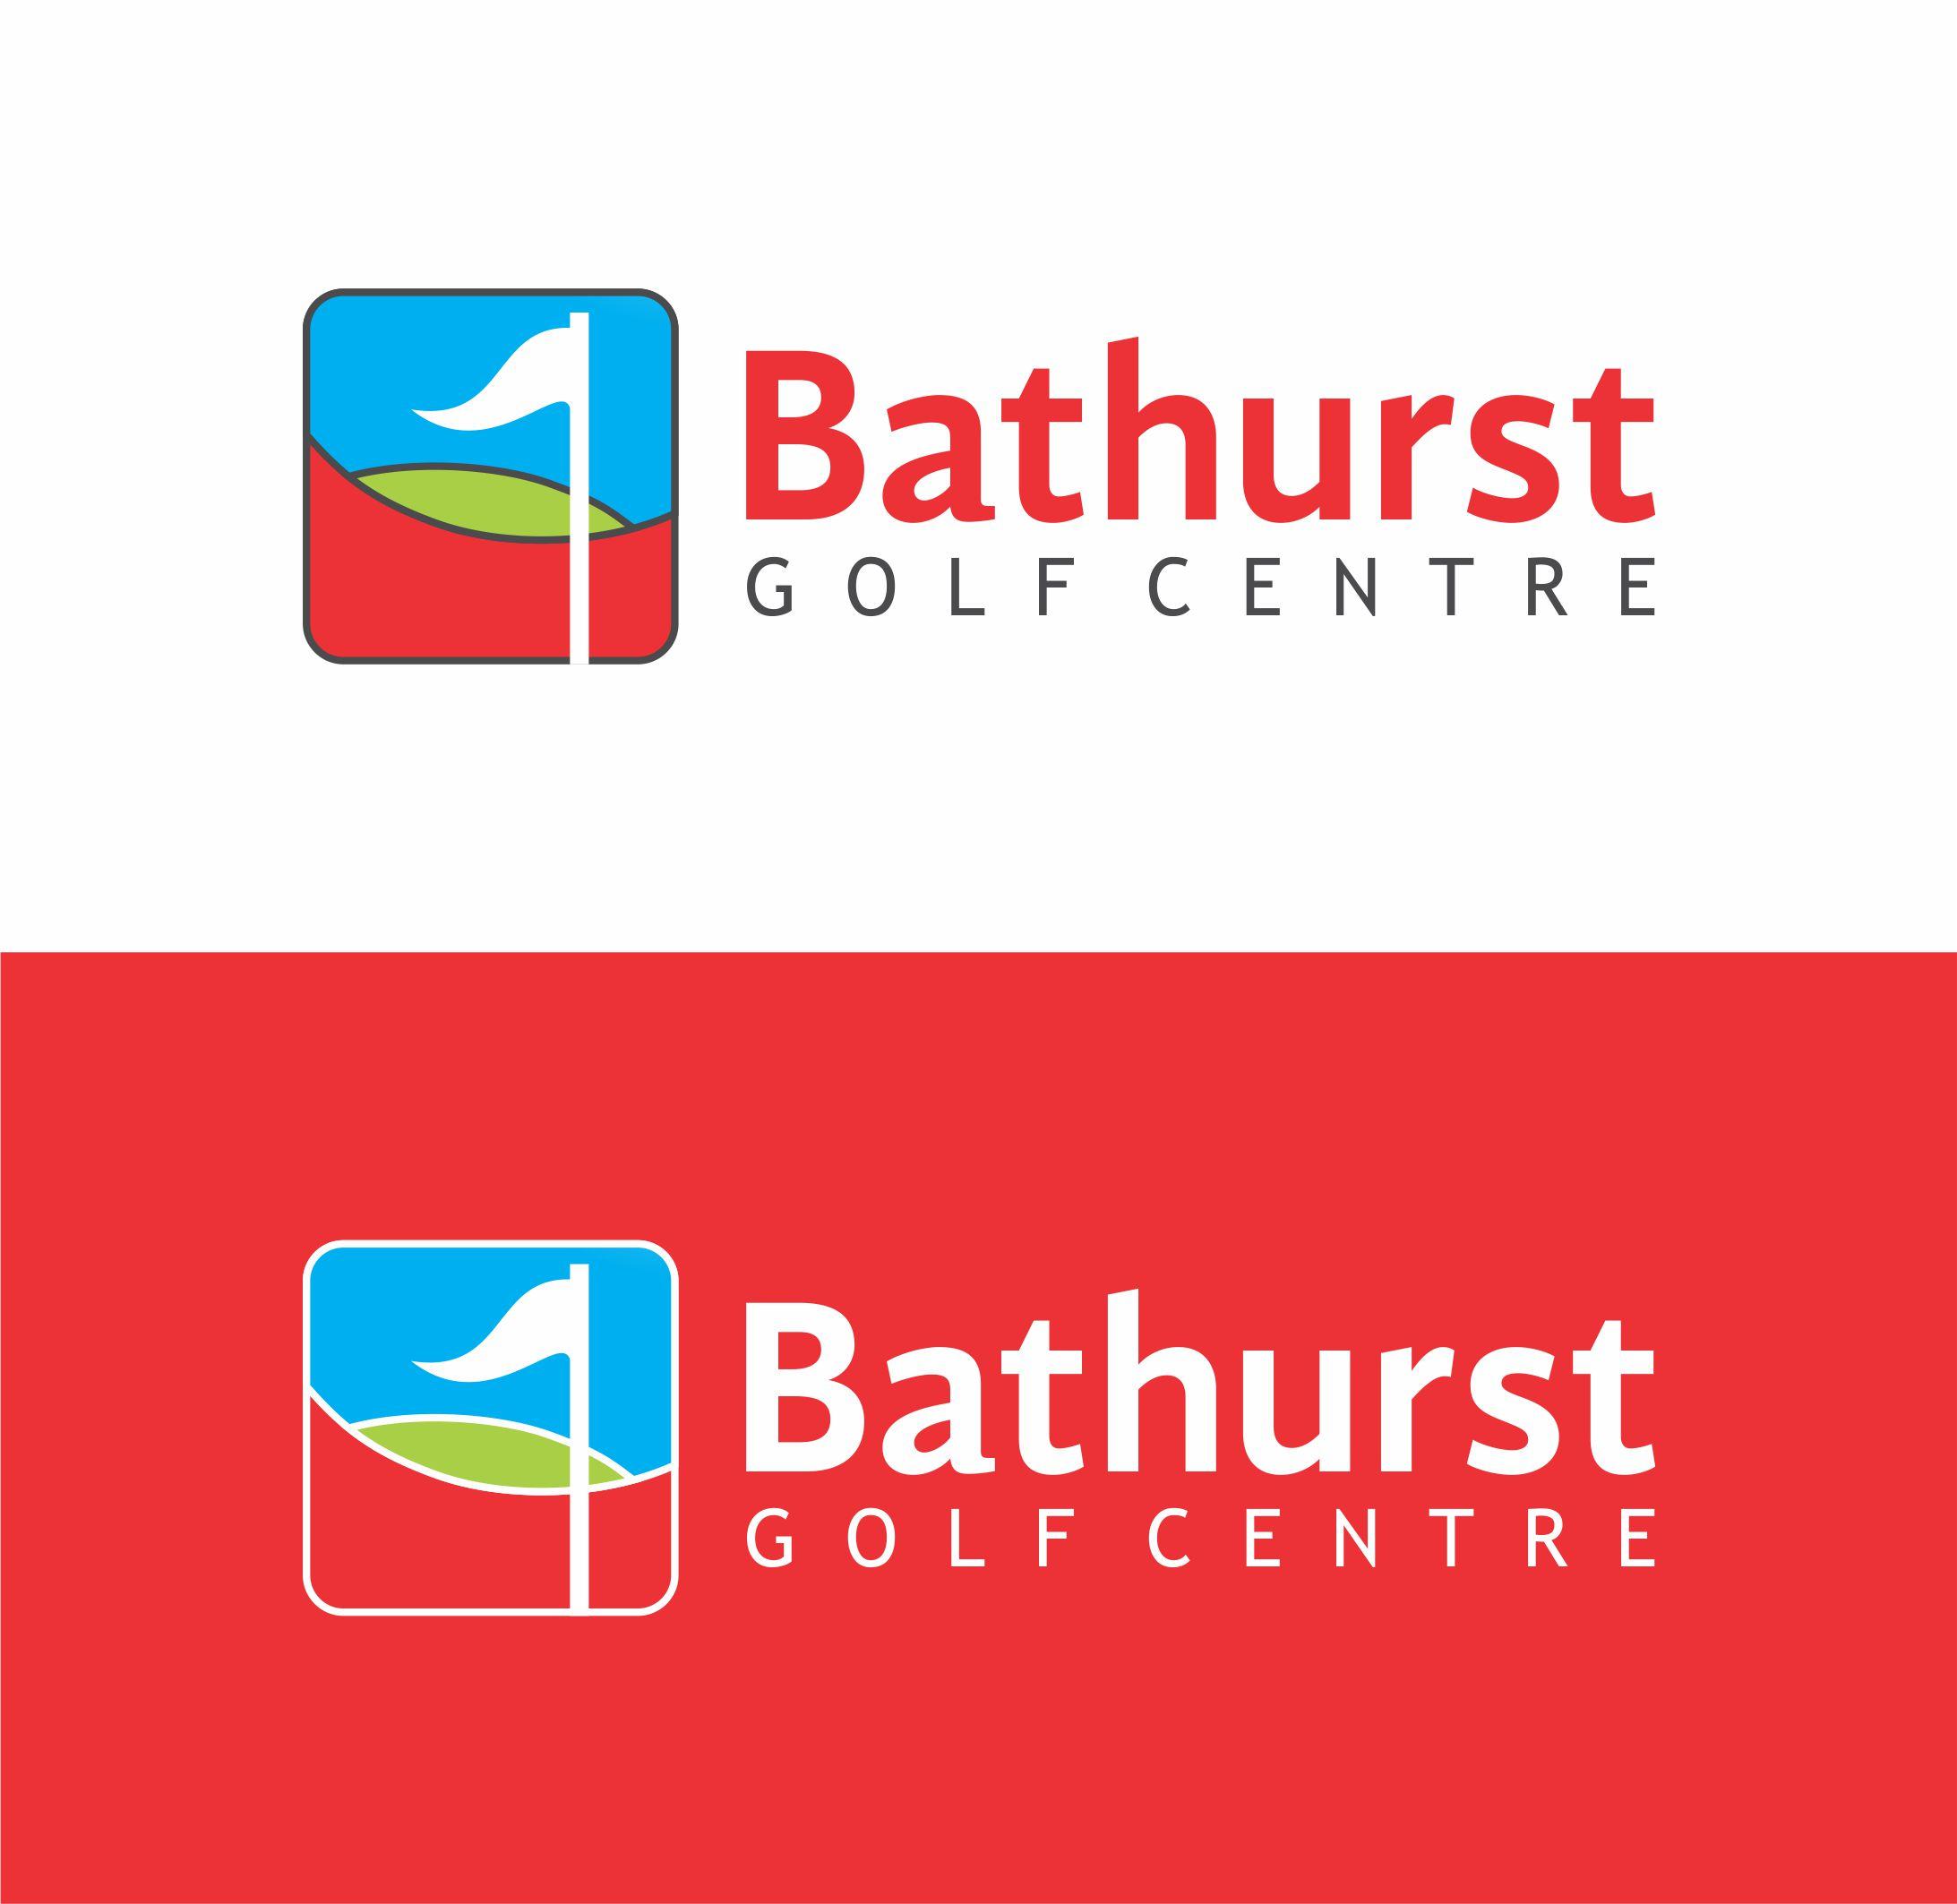 Logo Design by Amit Kaushik - Entry No. 93 in the Logo Design Contest Inspiring Logo Design for Bathurst Golf Centre.